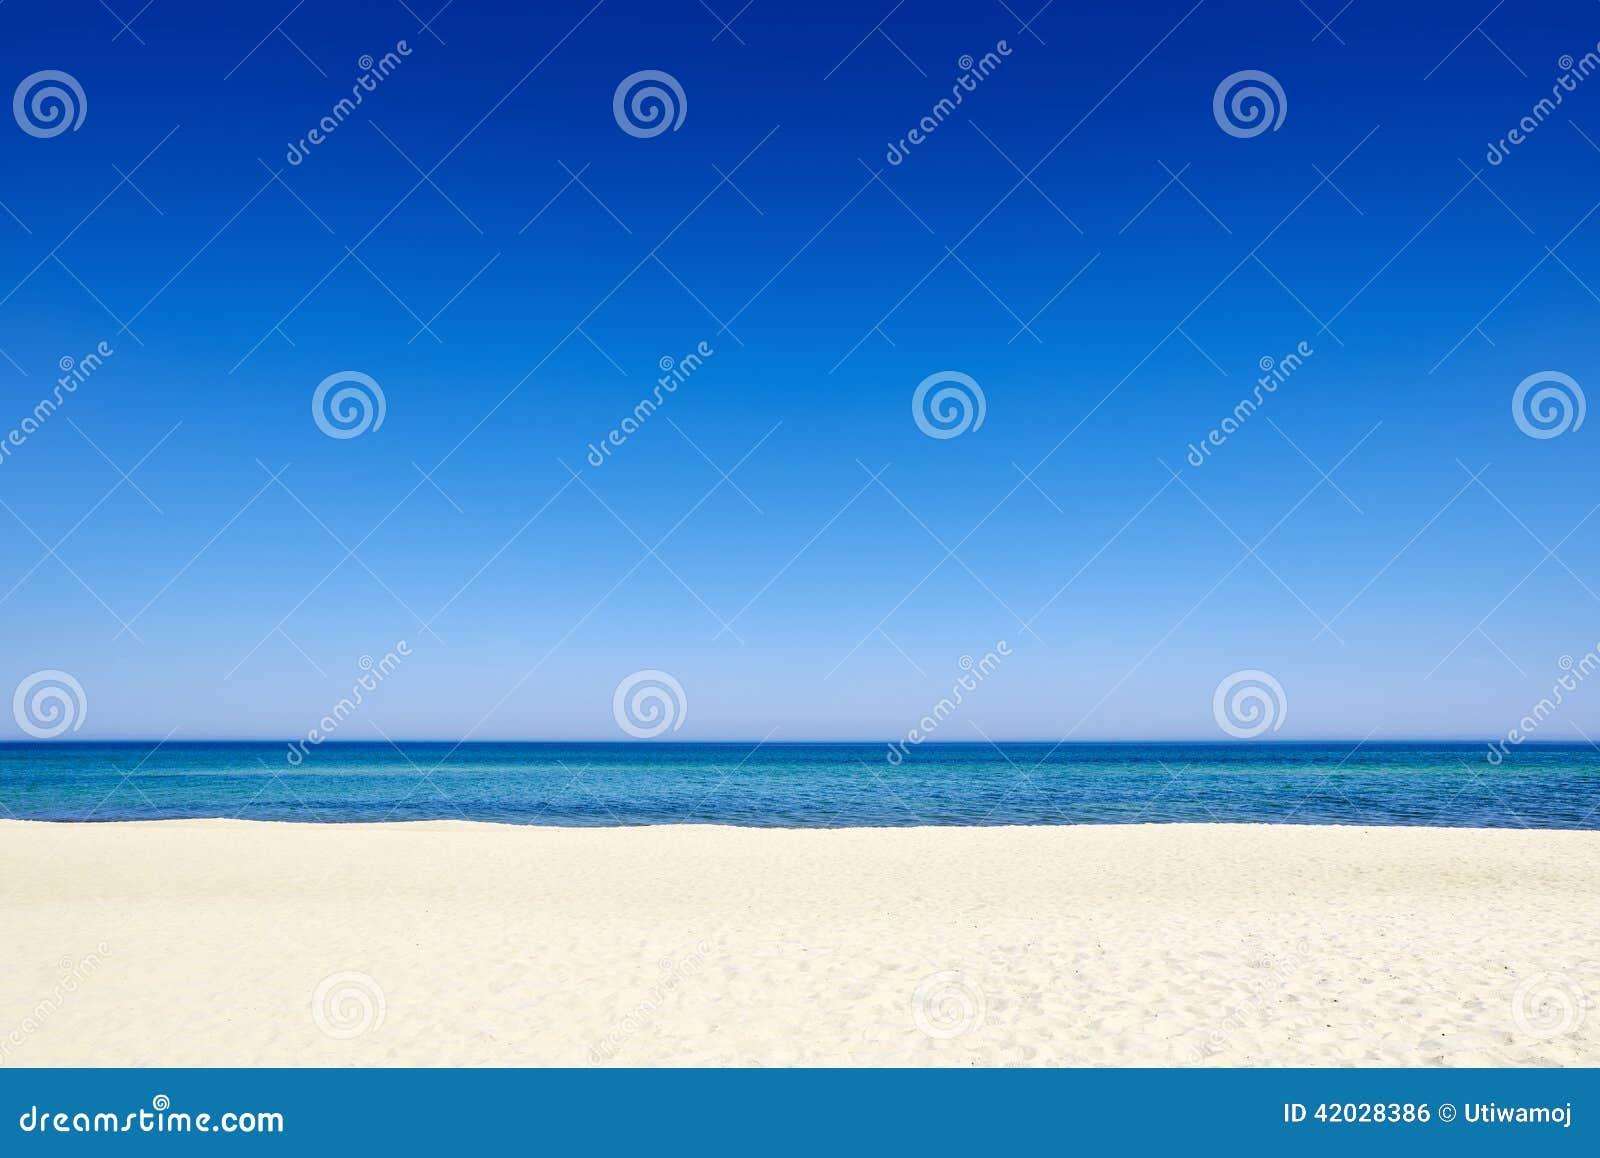 Summer blue sky sea coast sand background beach